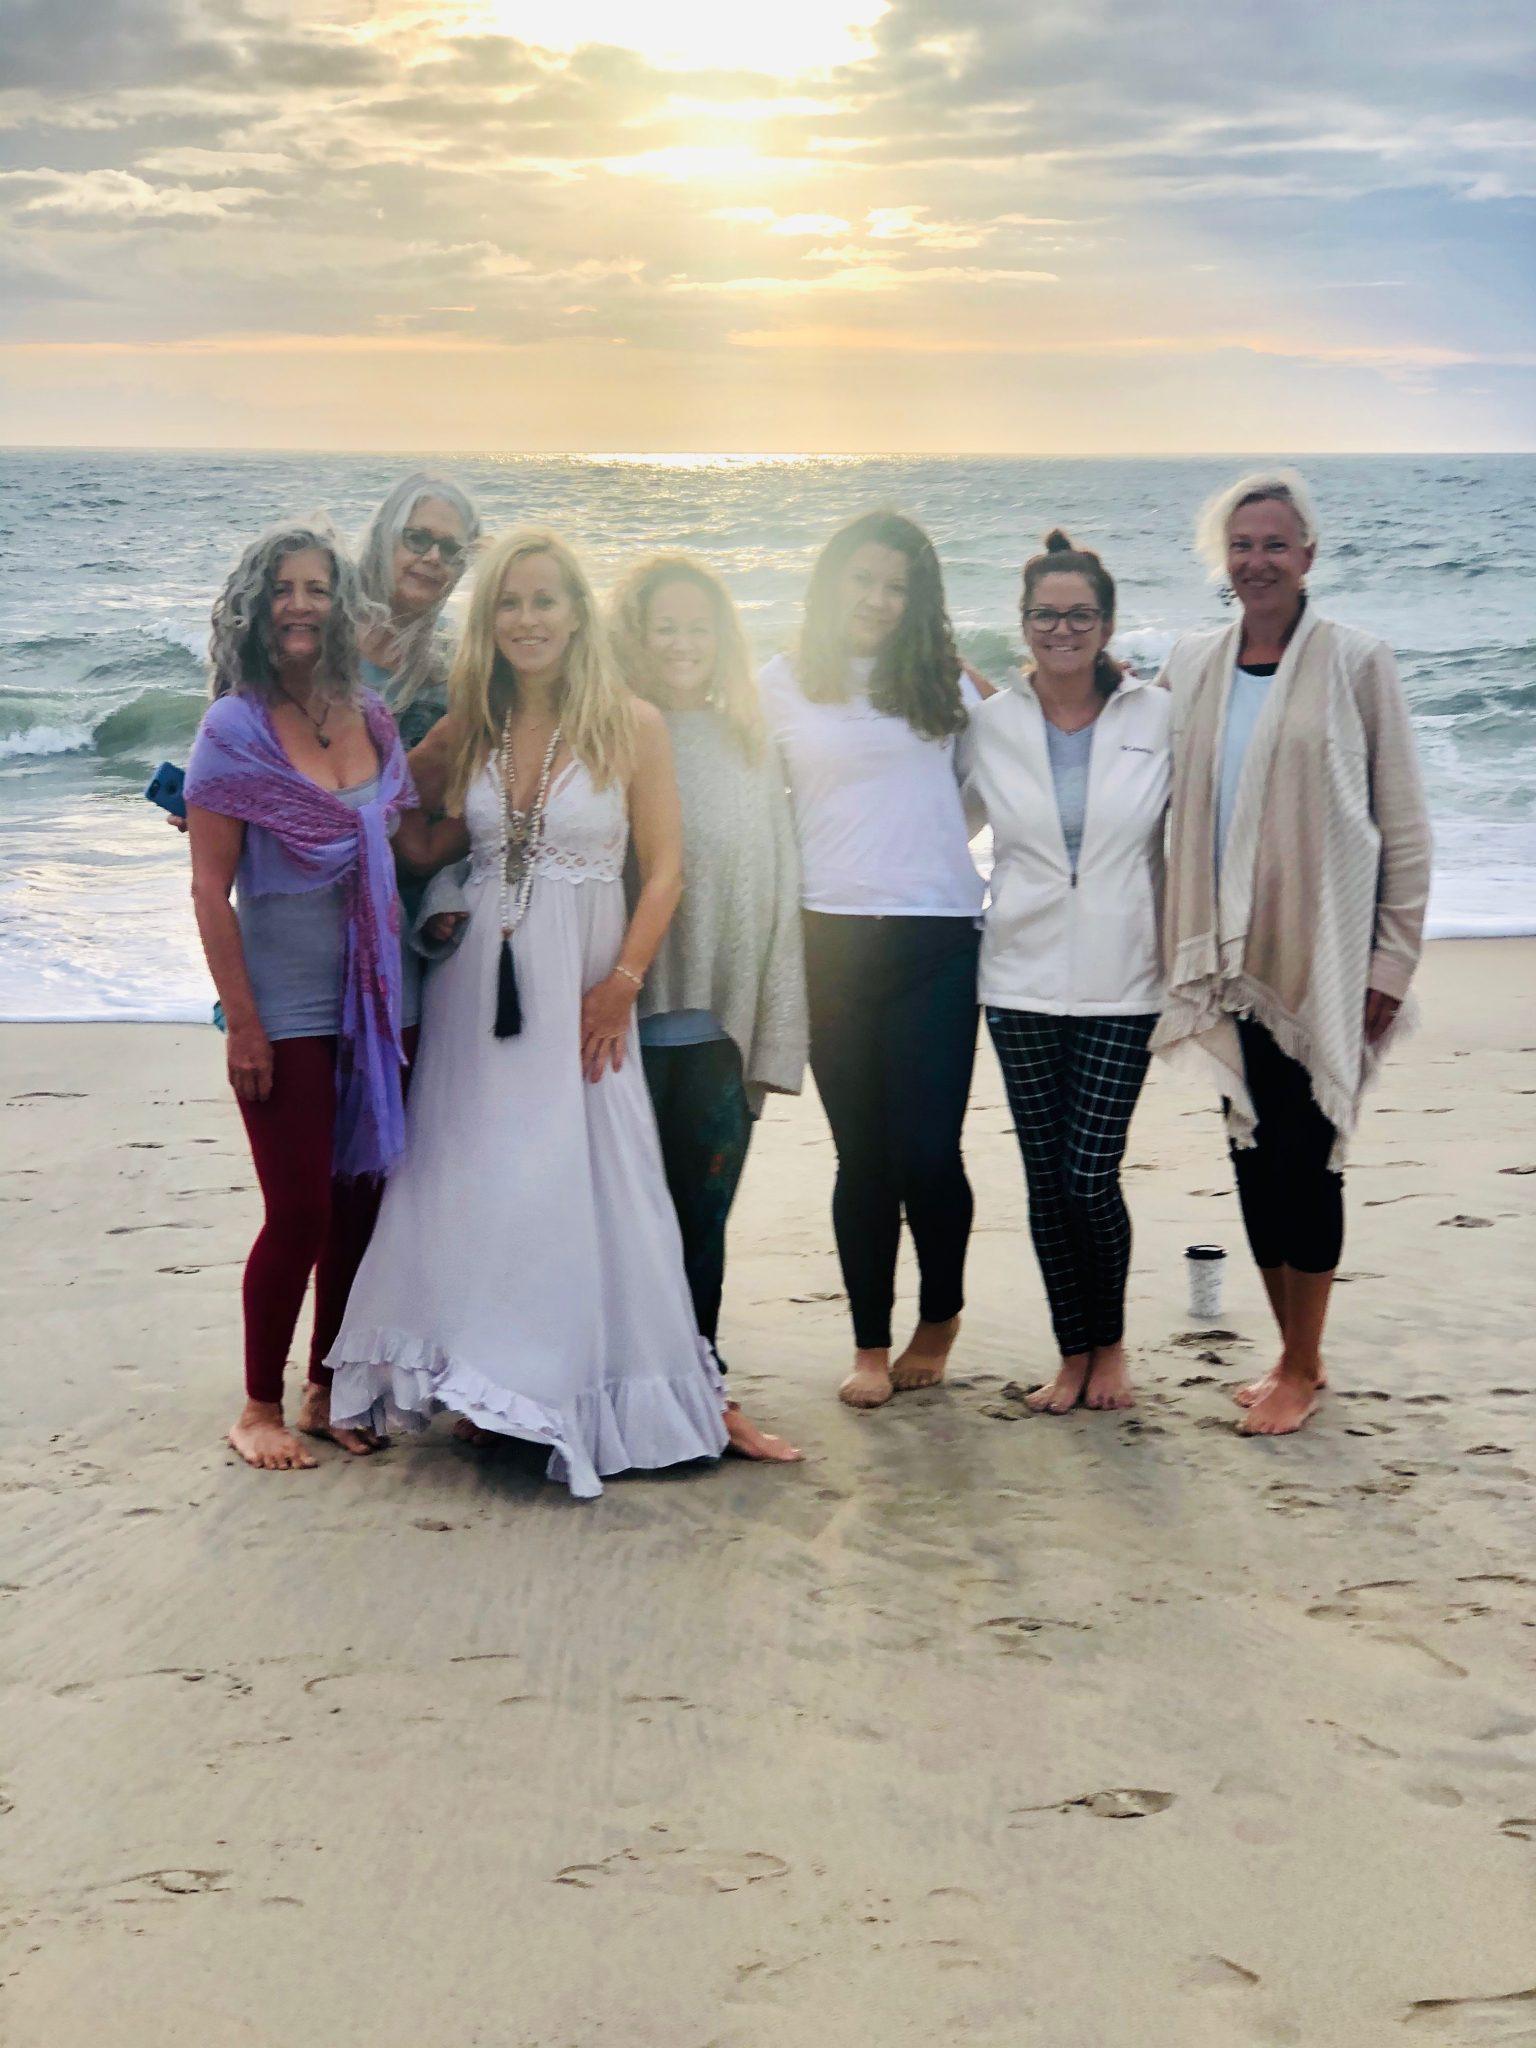 IMG 7532 - Life Coach, Reiki Master, Meditation